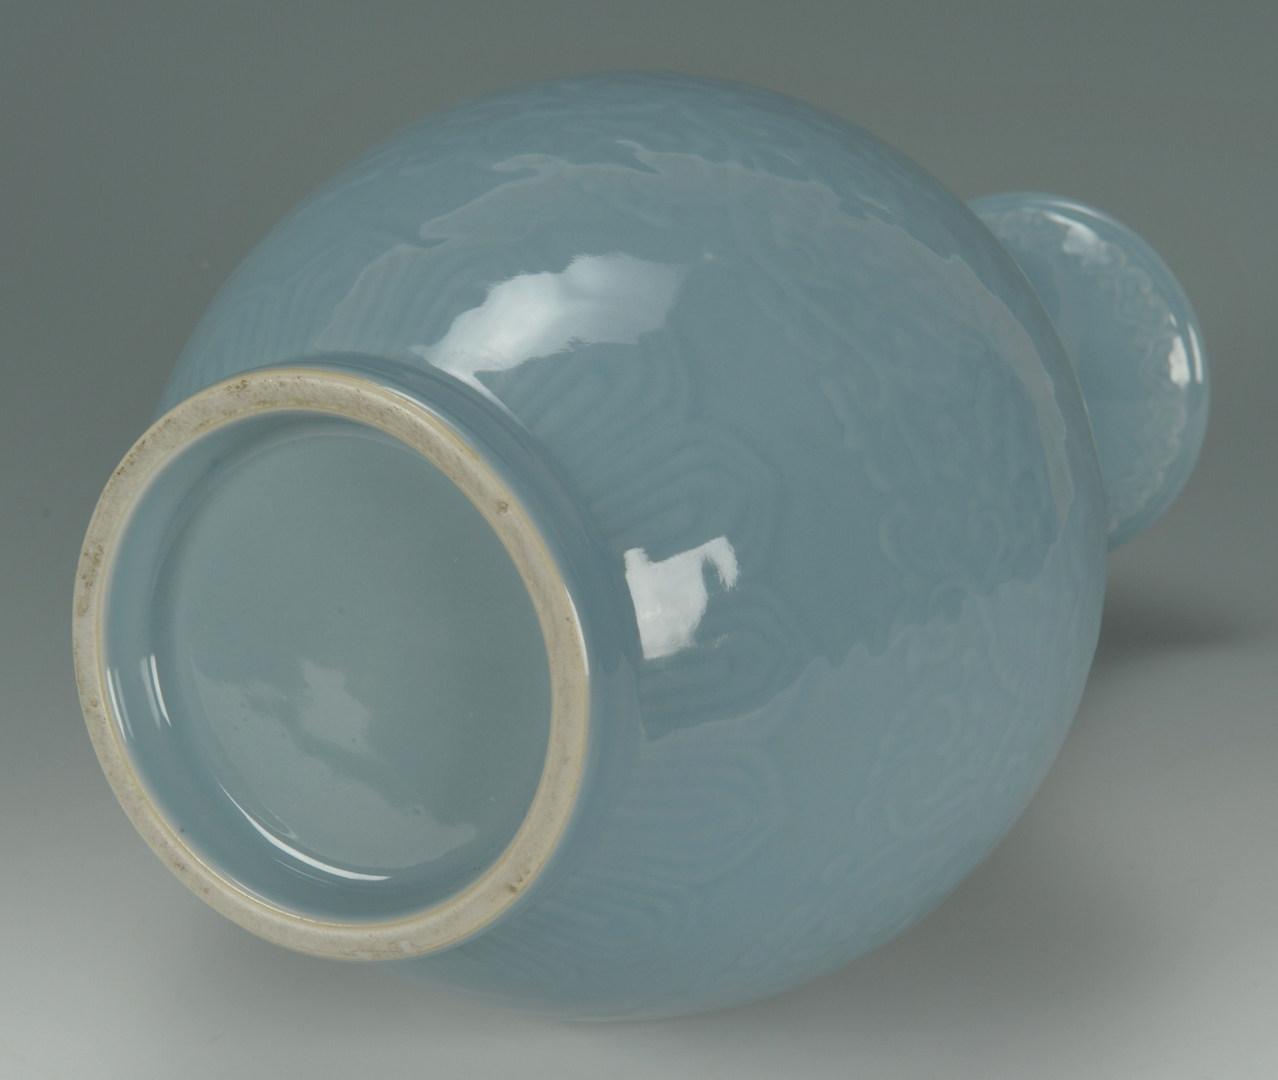 Lot 197: Chinese Blue Glaze Porcelain Bottle Vase